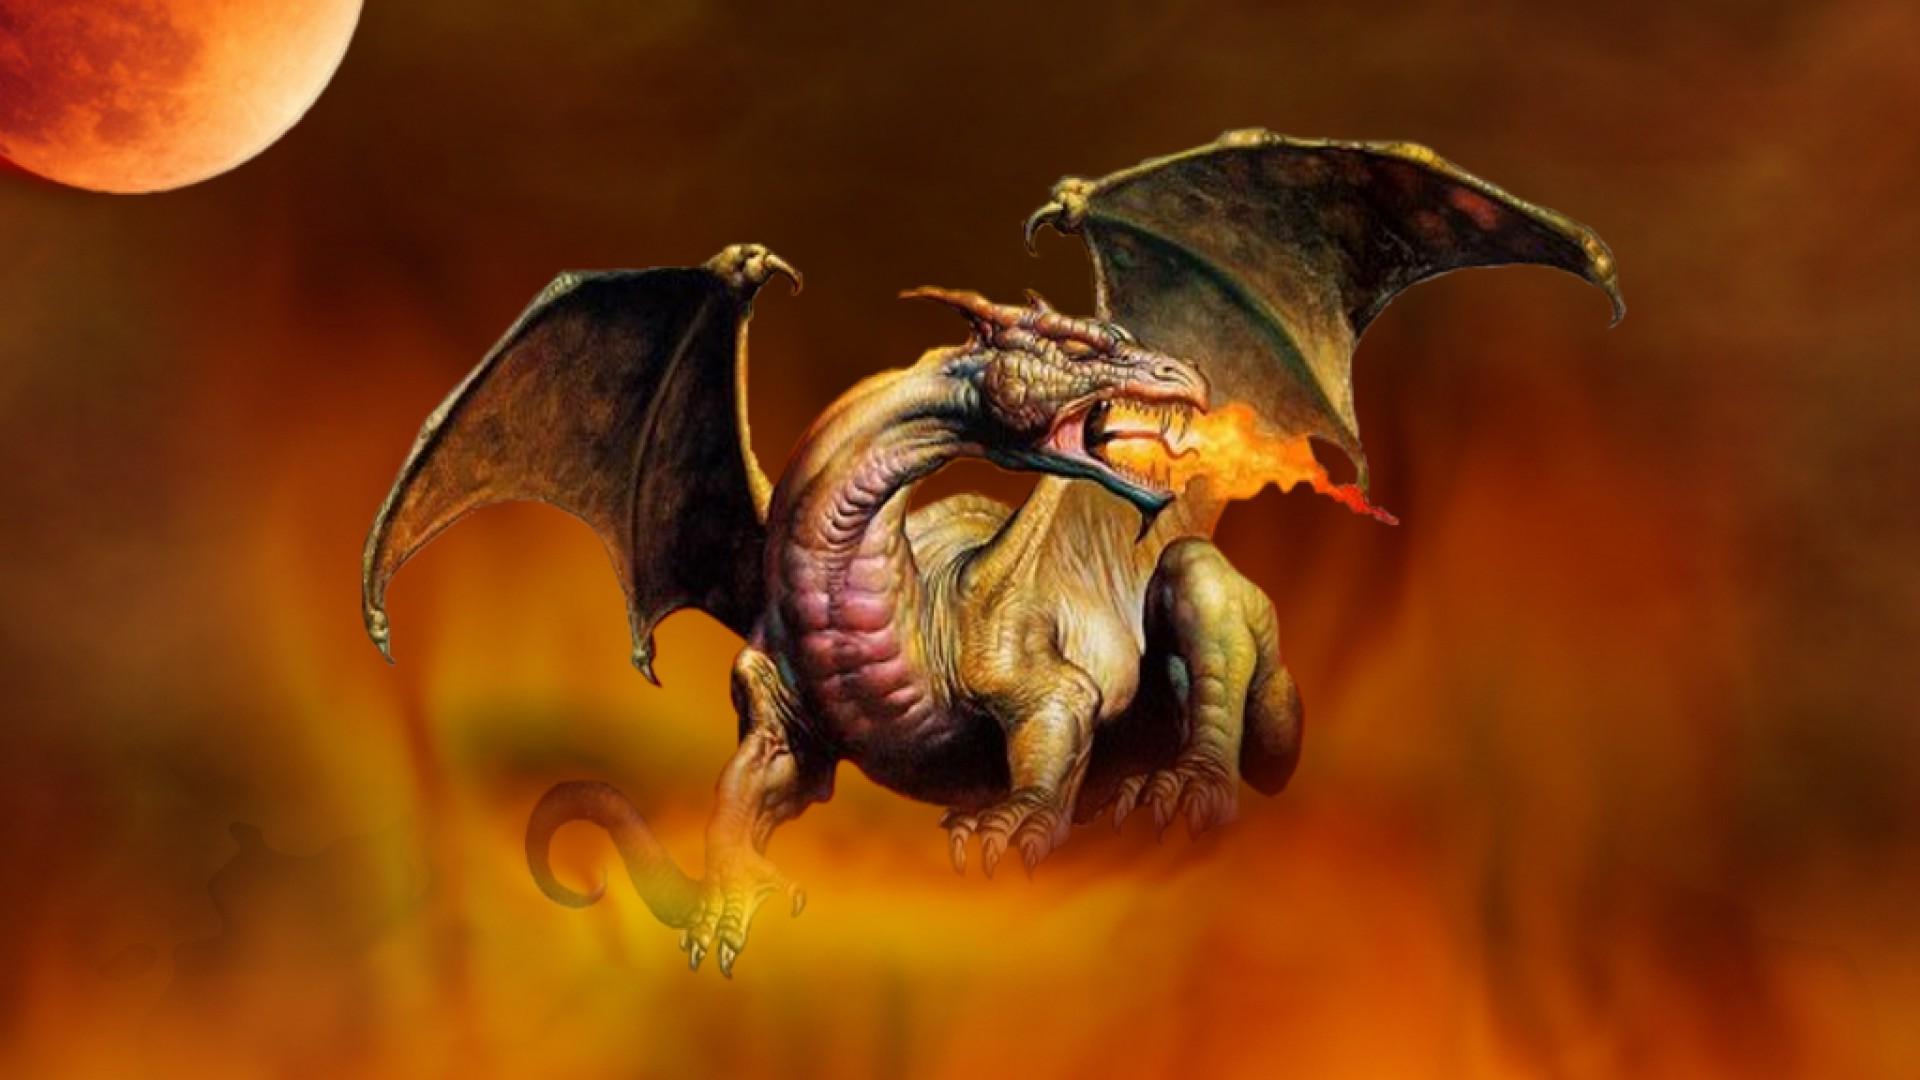 Drachen Full HD Wallpaper And Hintergrund